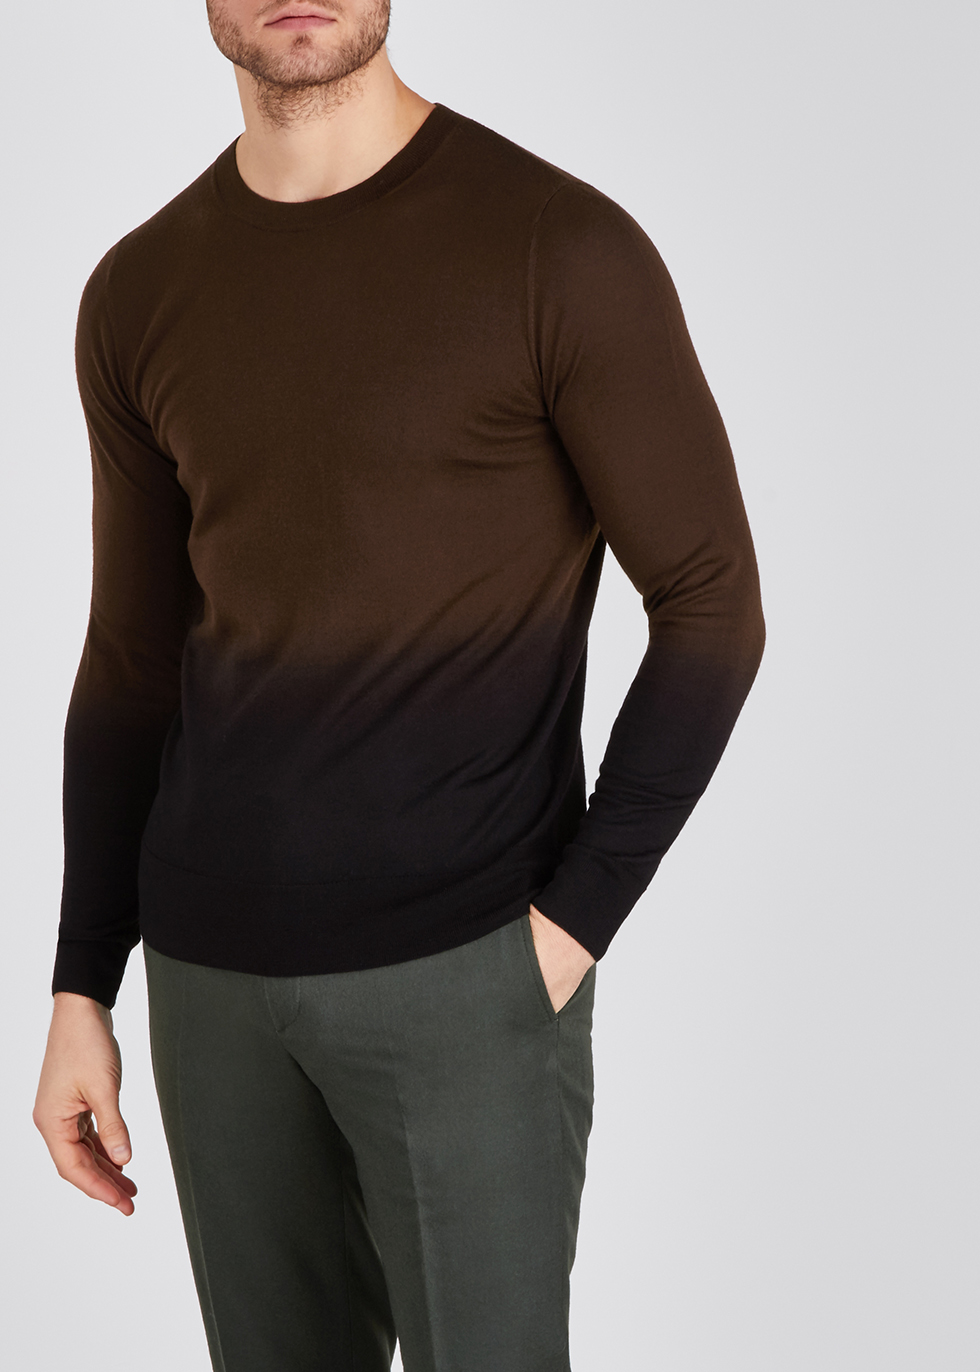 Nameday dégradé merino wool jumper - Dries Van Noten